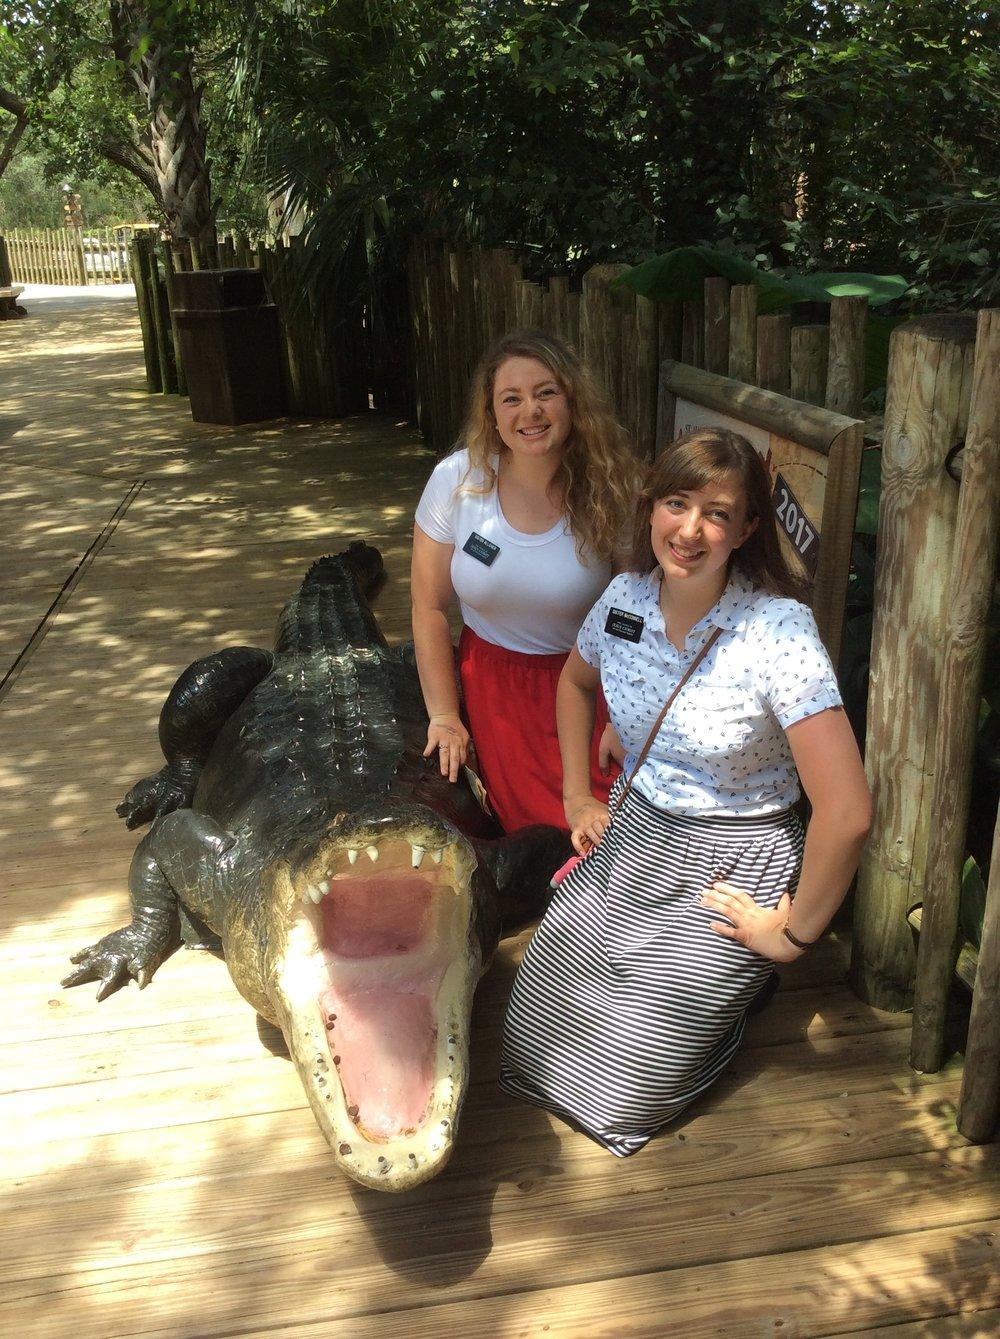 More Alligator Farm